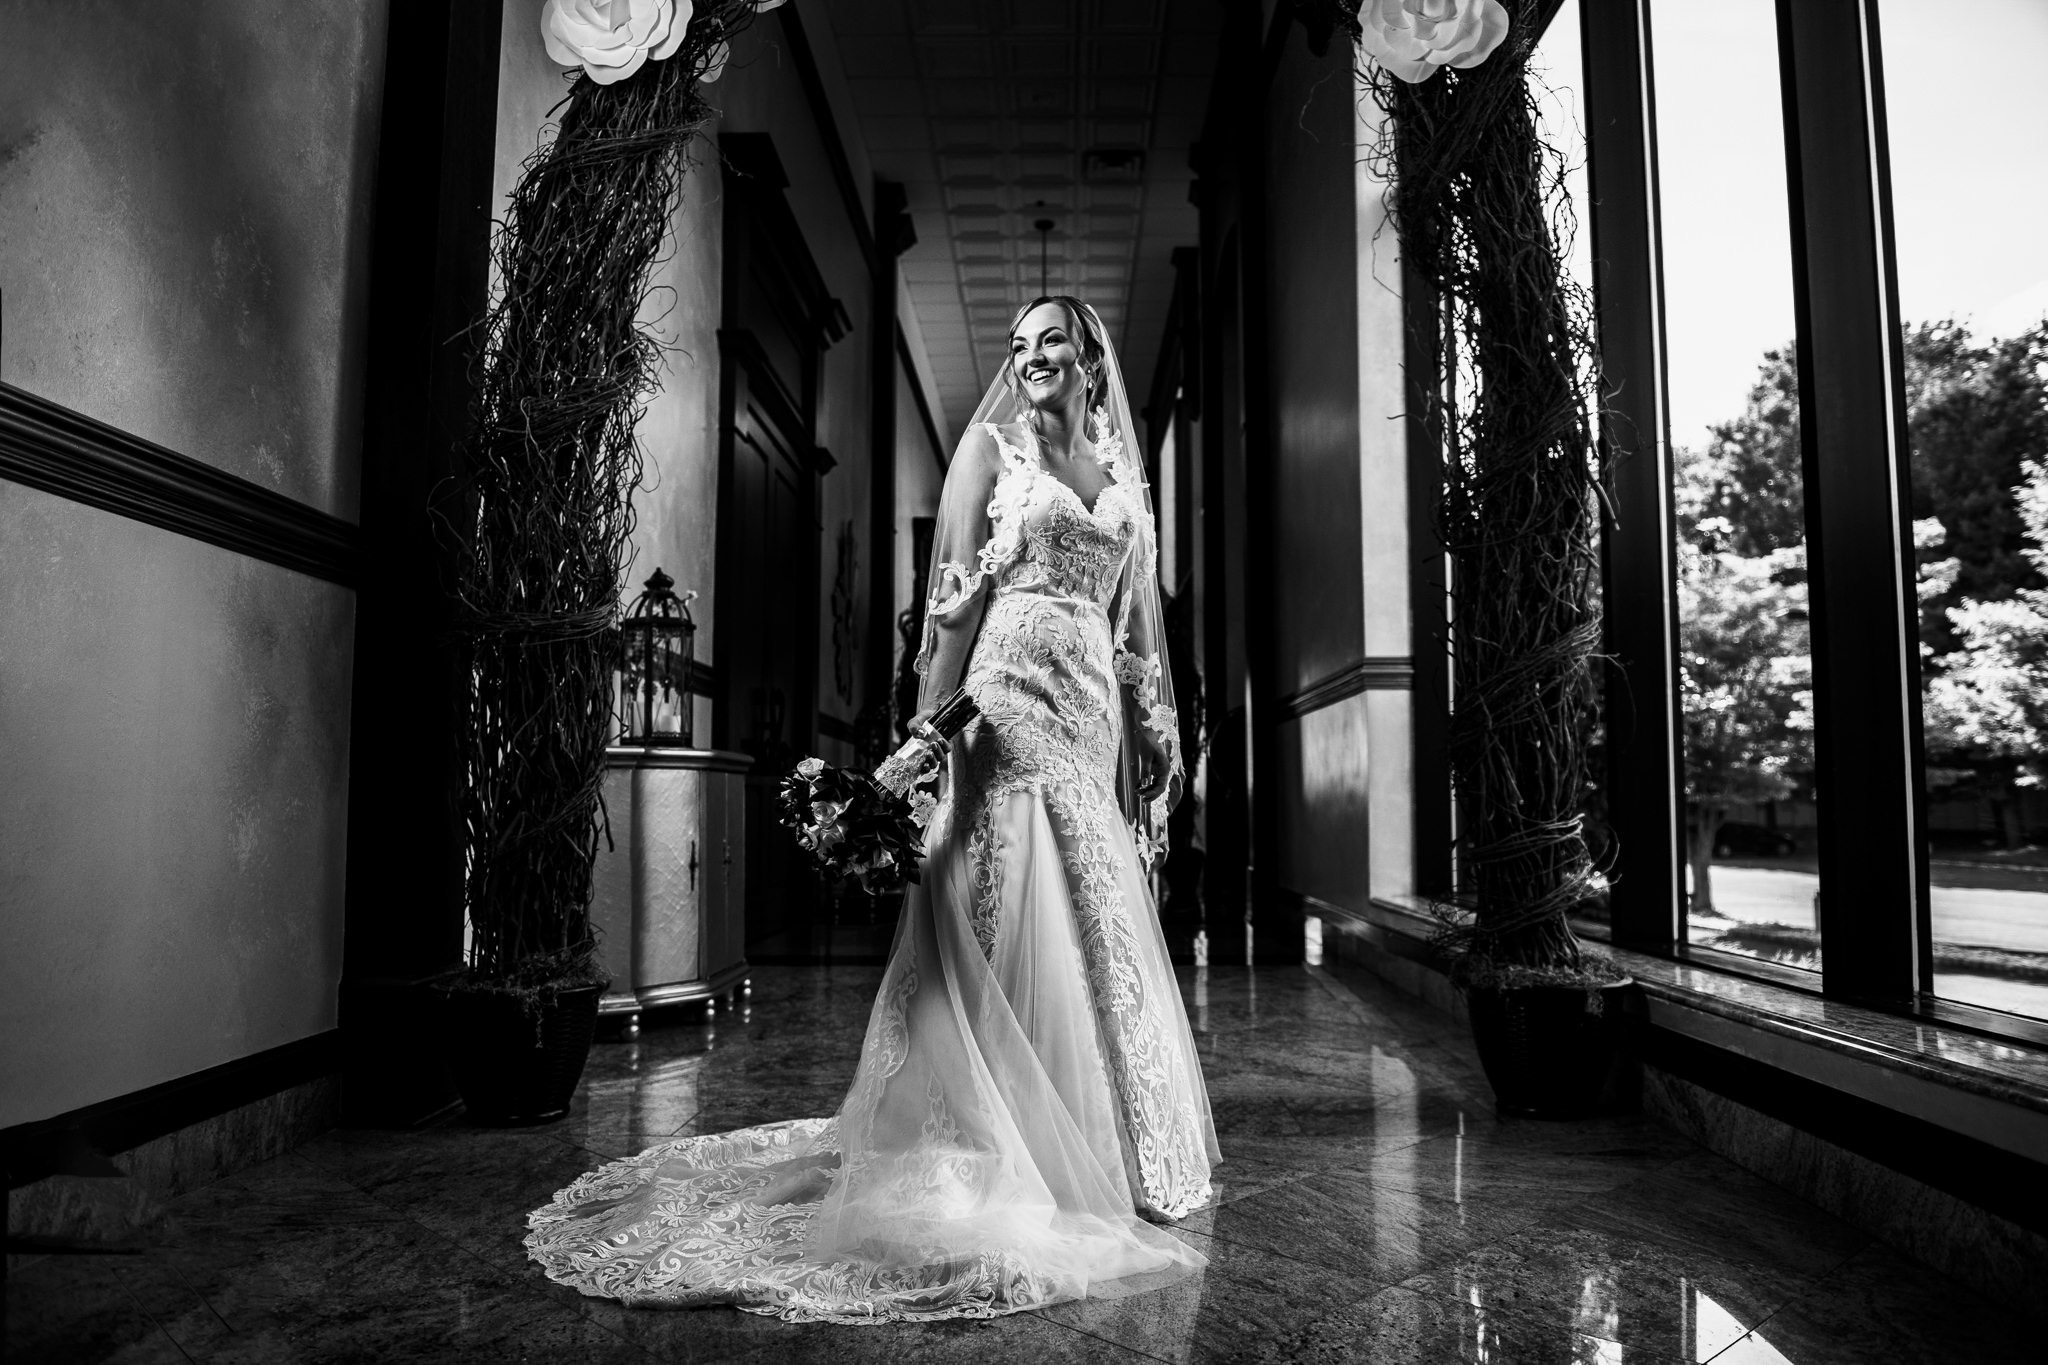 Brennan-South-Gate-Manor-New-Jersey-Wedding-Photographer-58.JPG